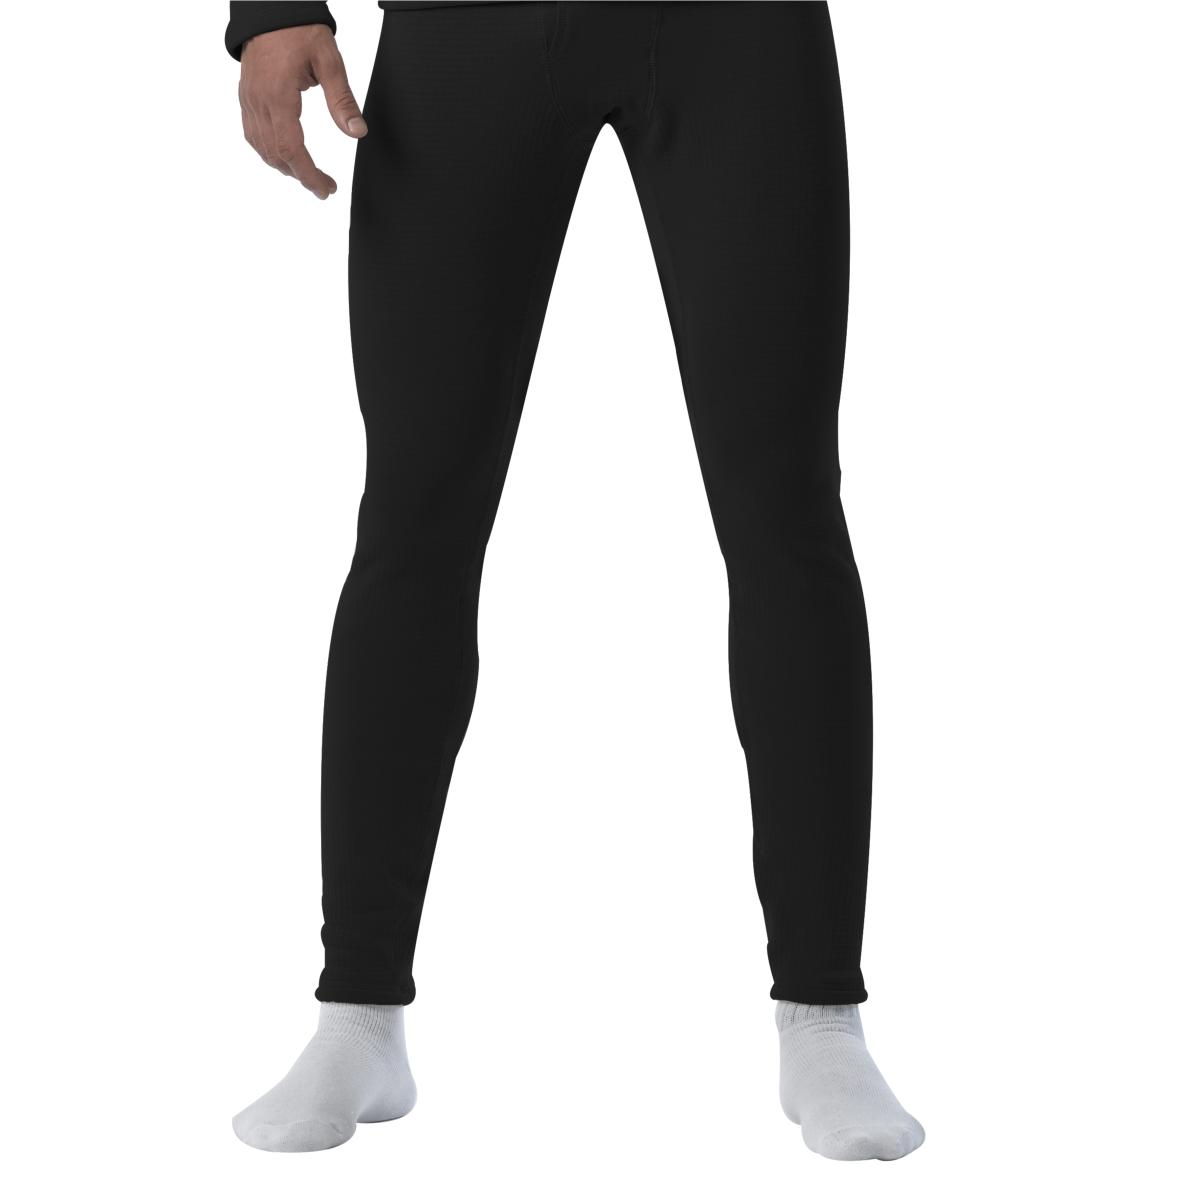 Rothco Gen III ECWCS Level II Thermal Underwear Pants, Black